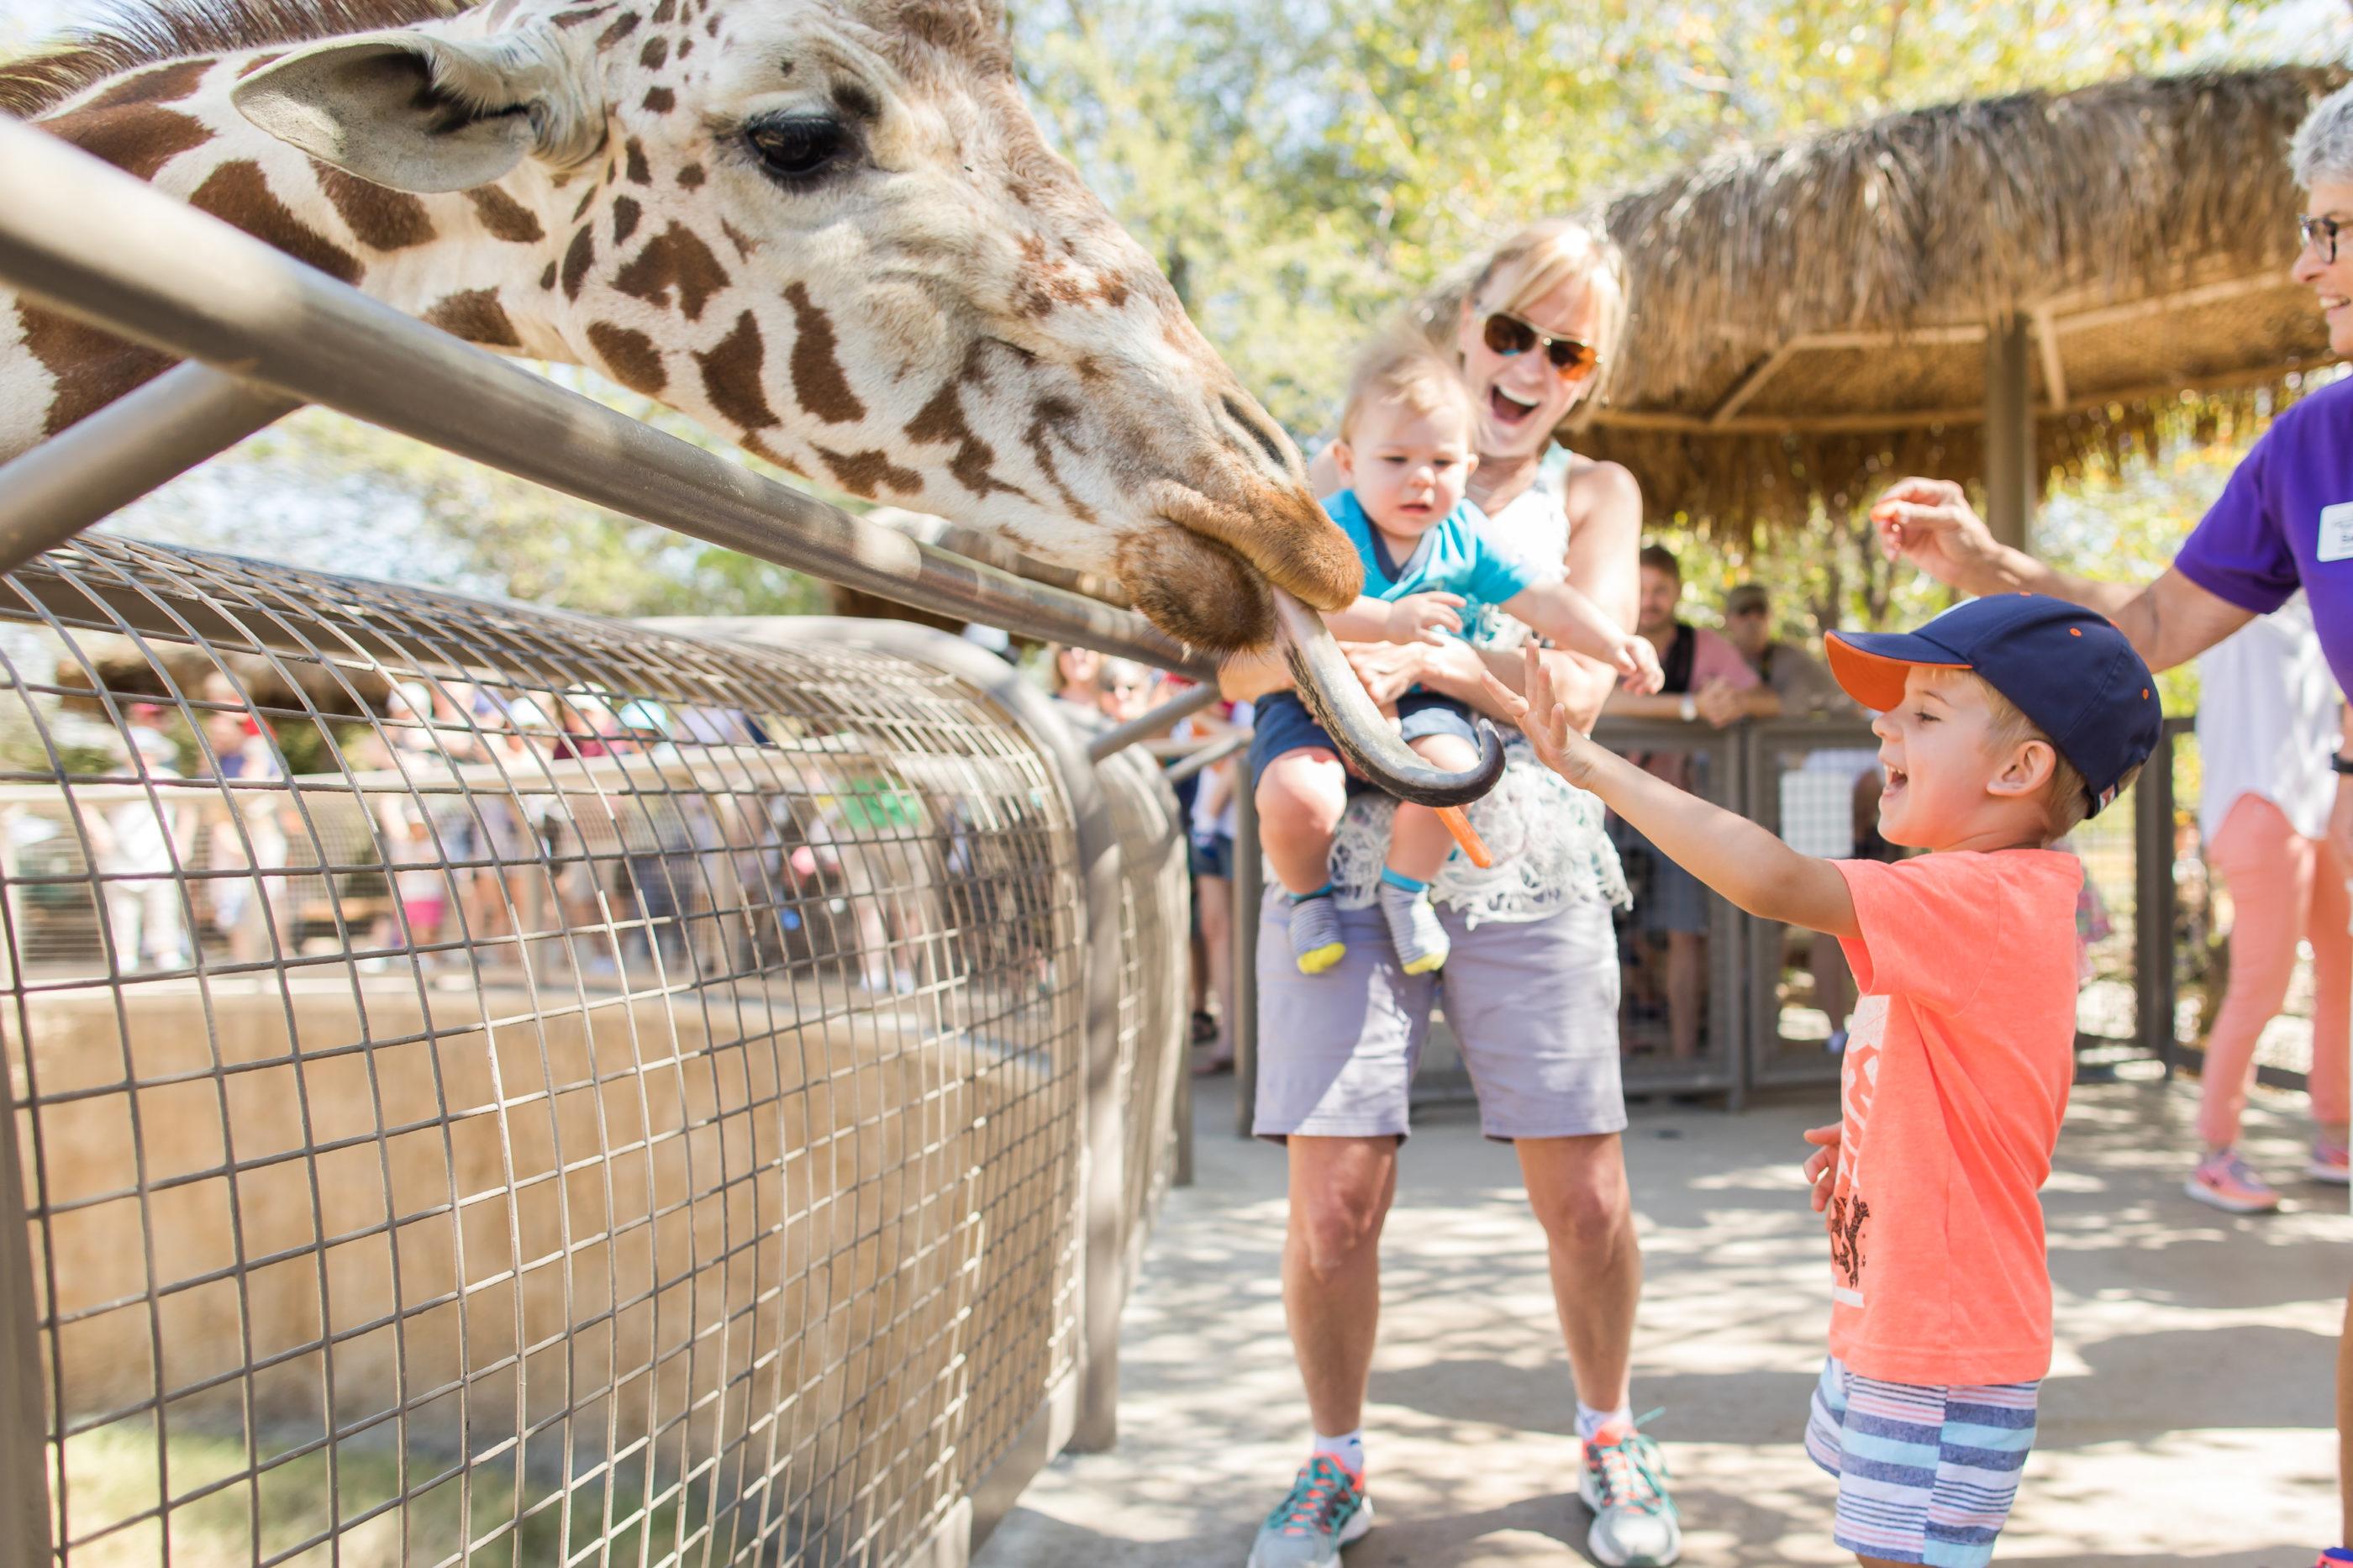 A little boy smiles while feeding a giraffe.